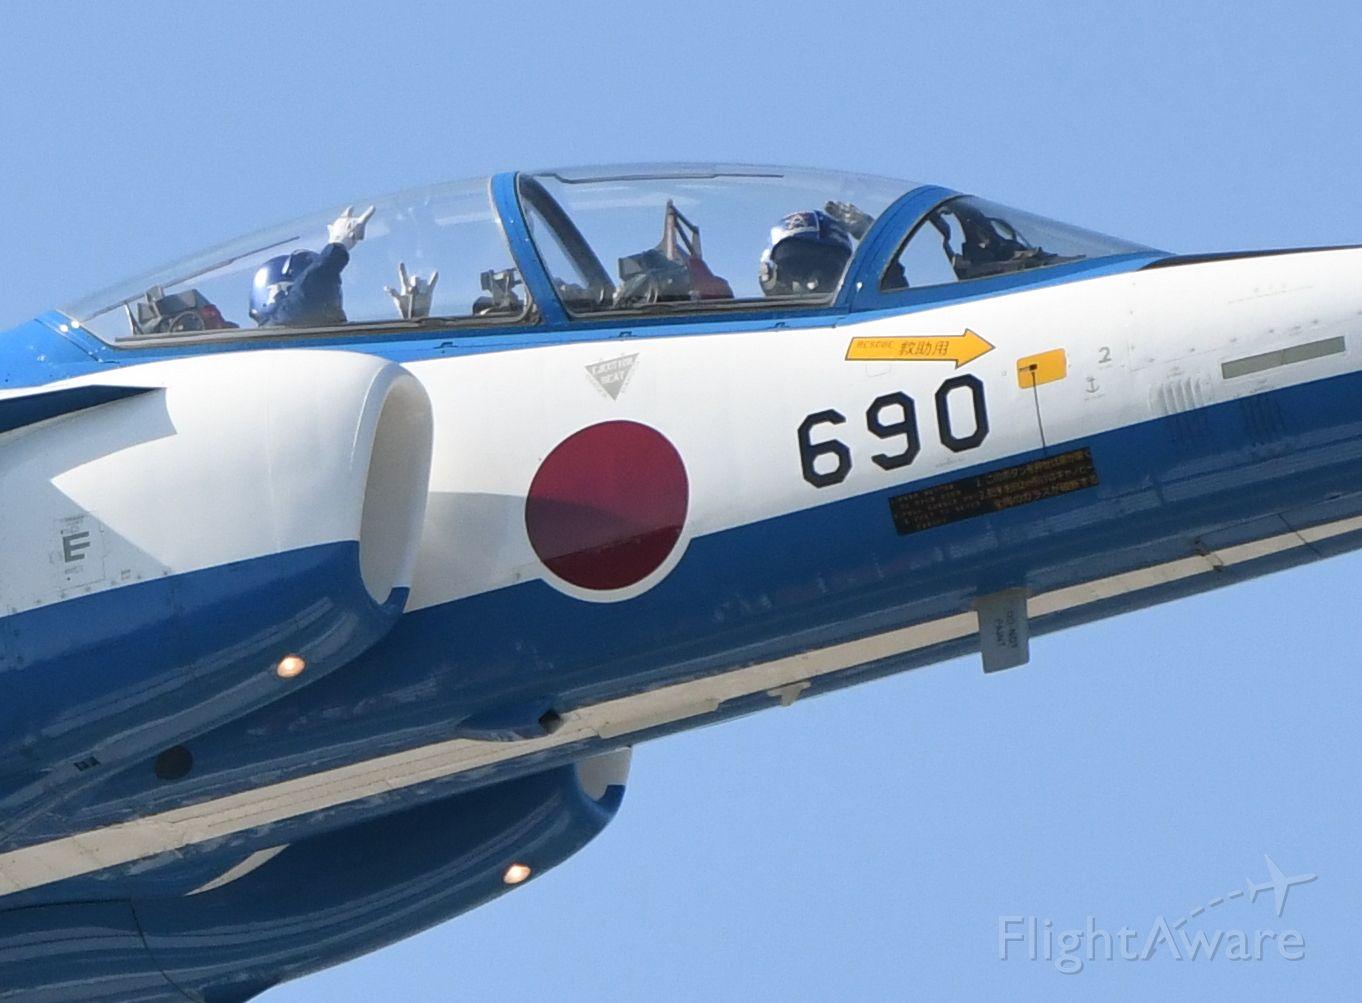 KAWASAKI T-4 (26-5690) - November 4, 2019br /at Iruma Air Force Basebr /Blue Impulse #5